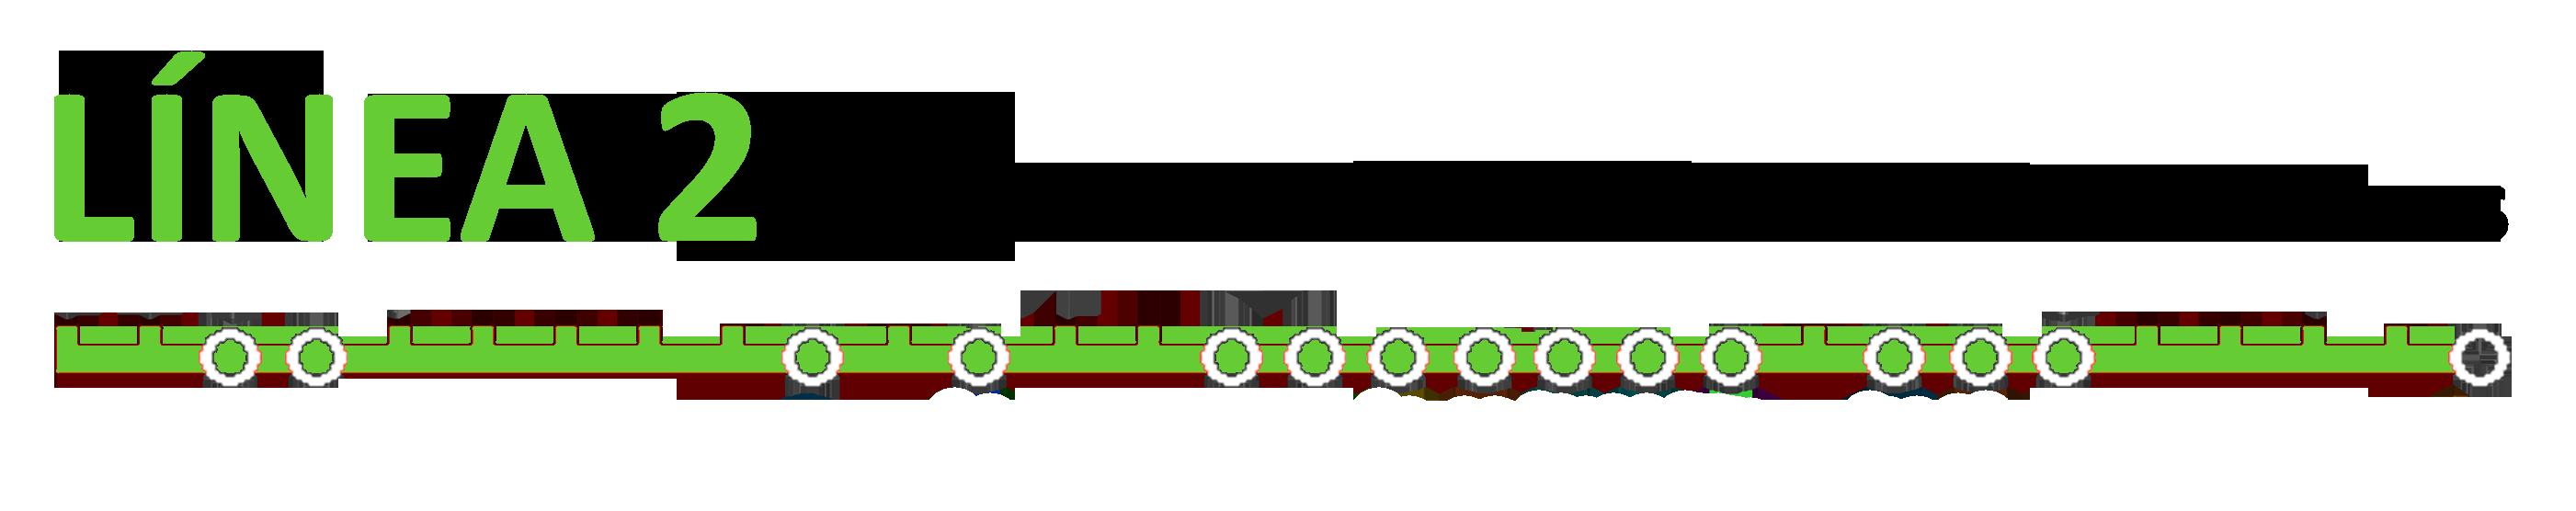 Linea2_web